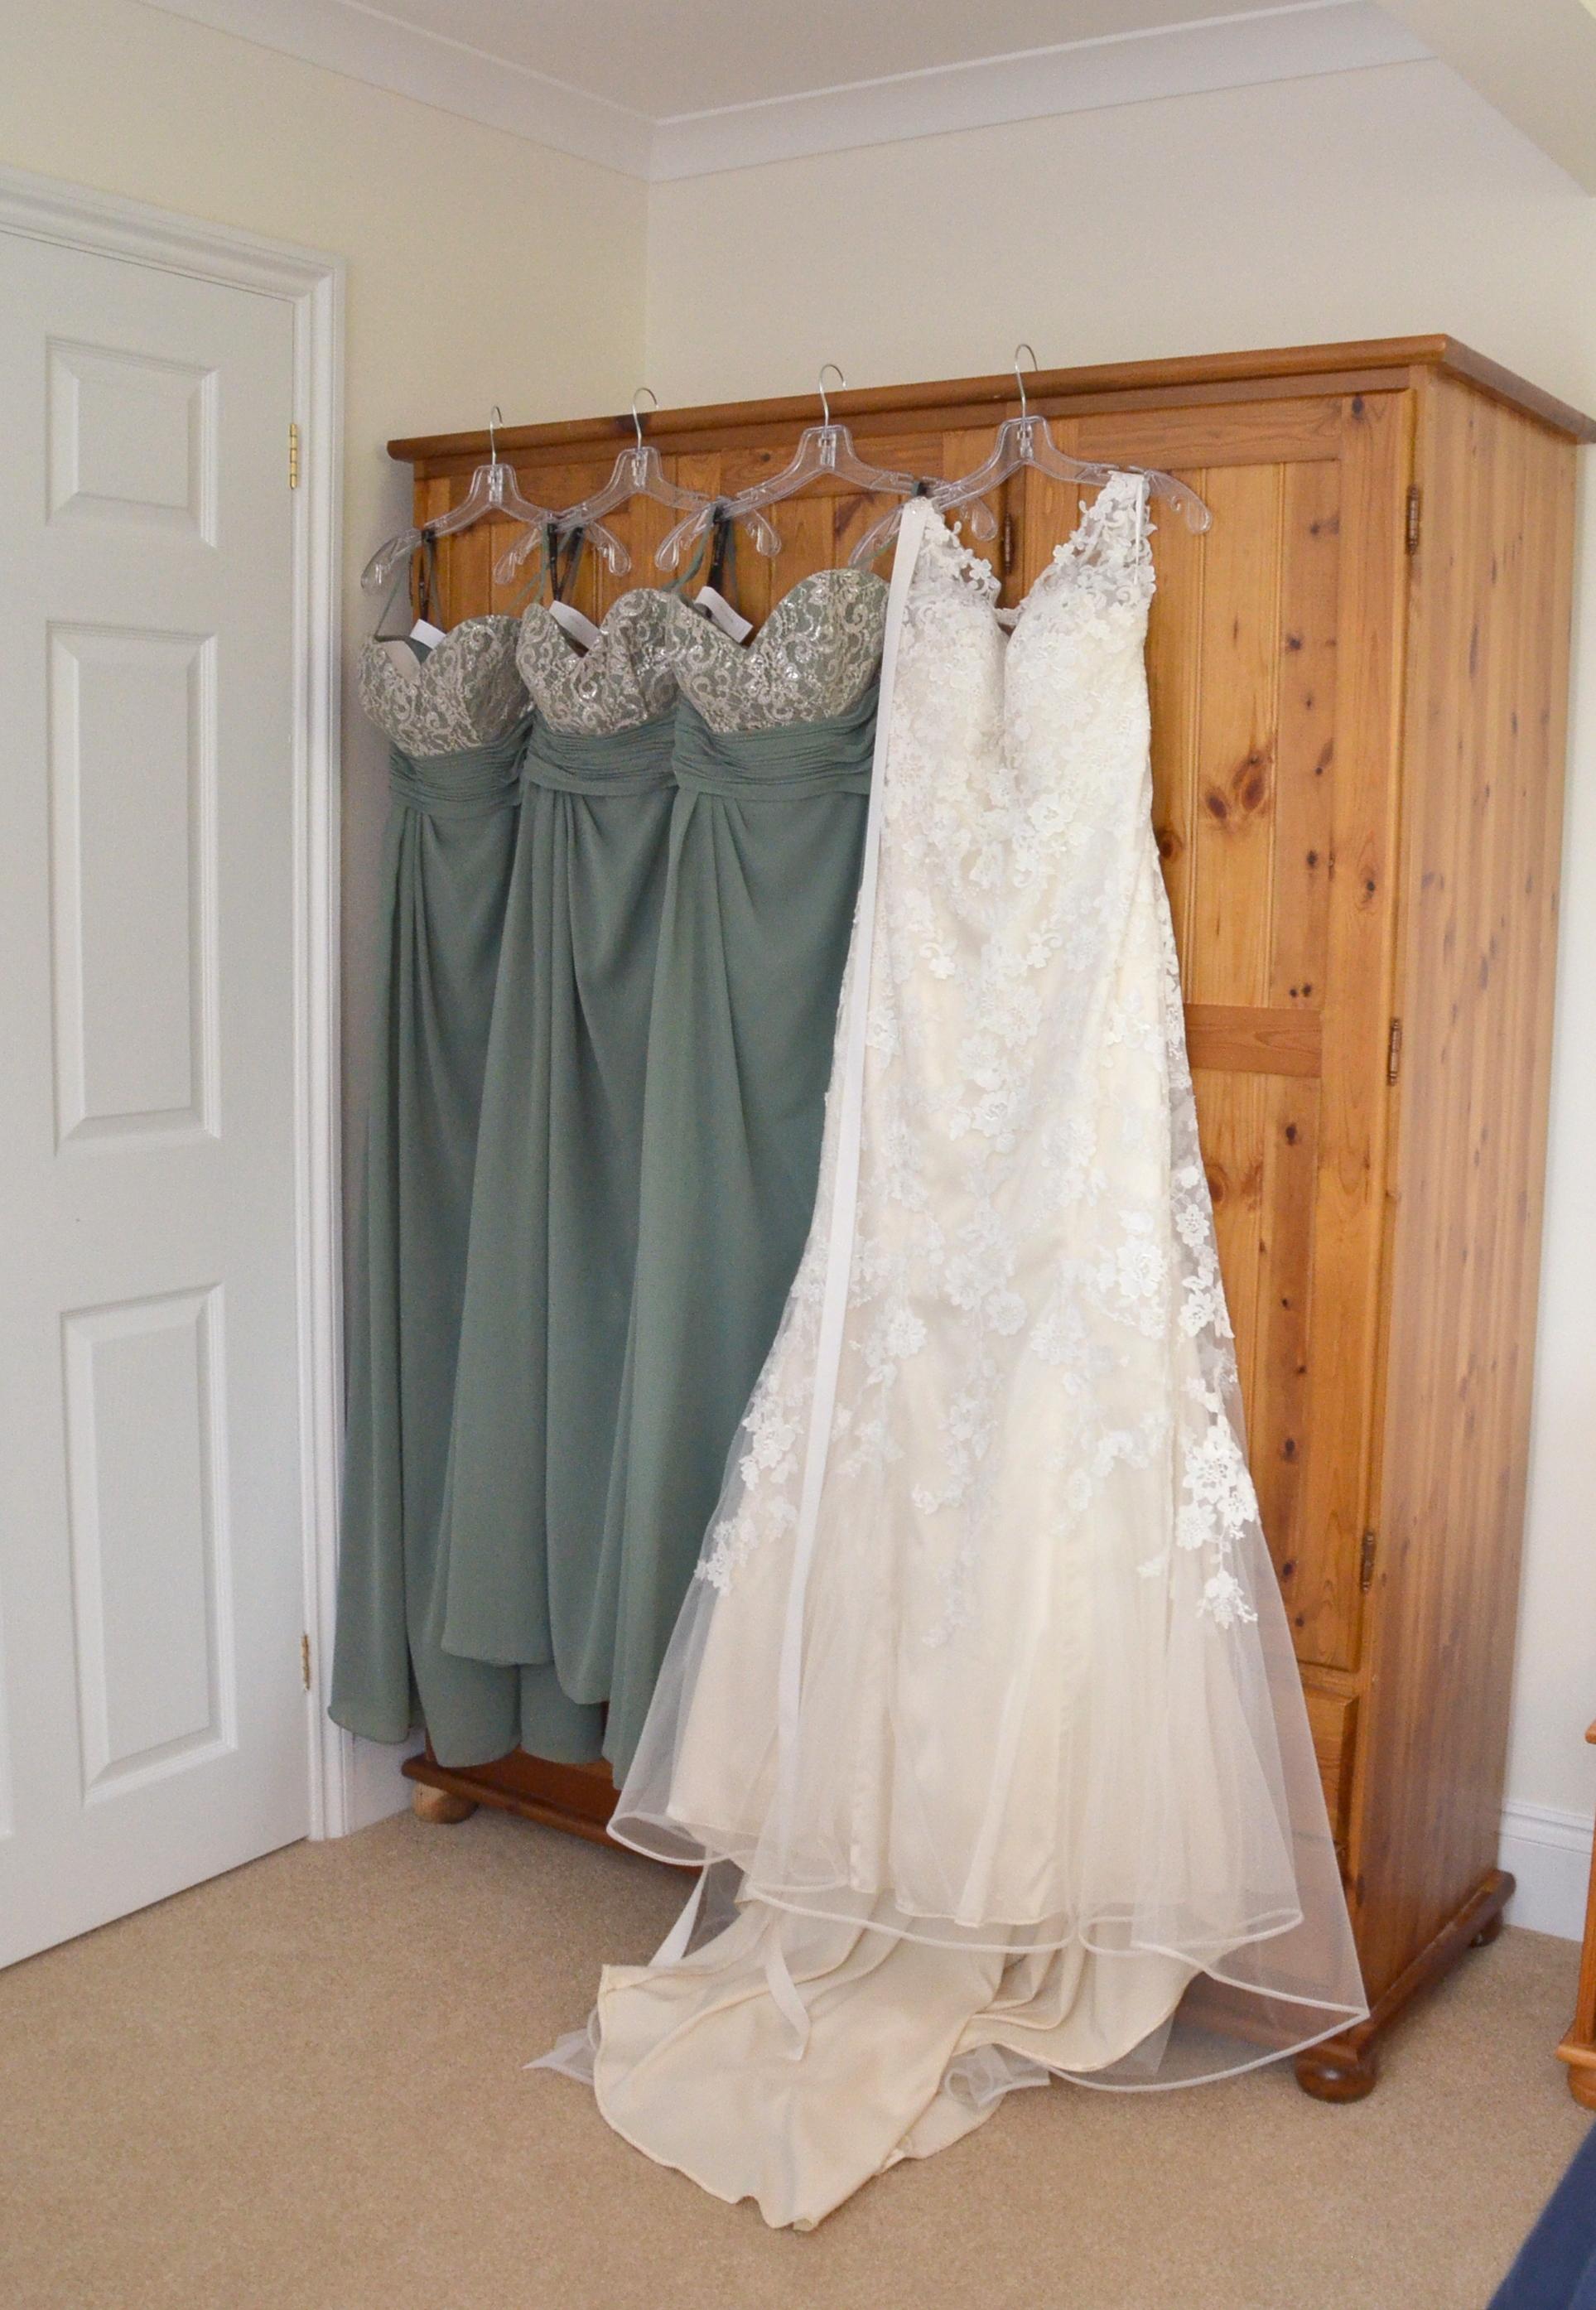 Wedding and Bridesmaids Dresses, Celebration, Clothes, Dress, Dresses, HQ Photo